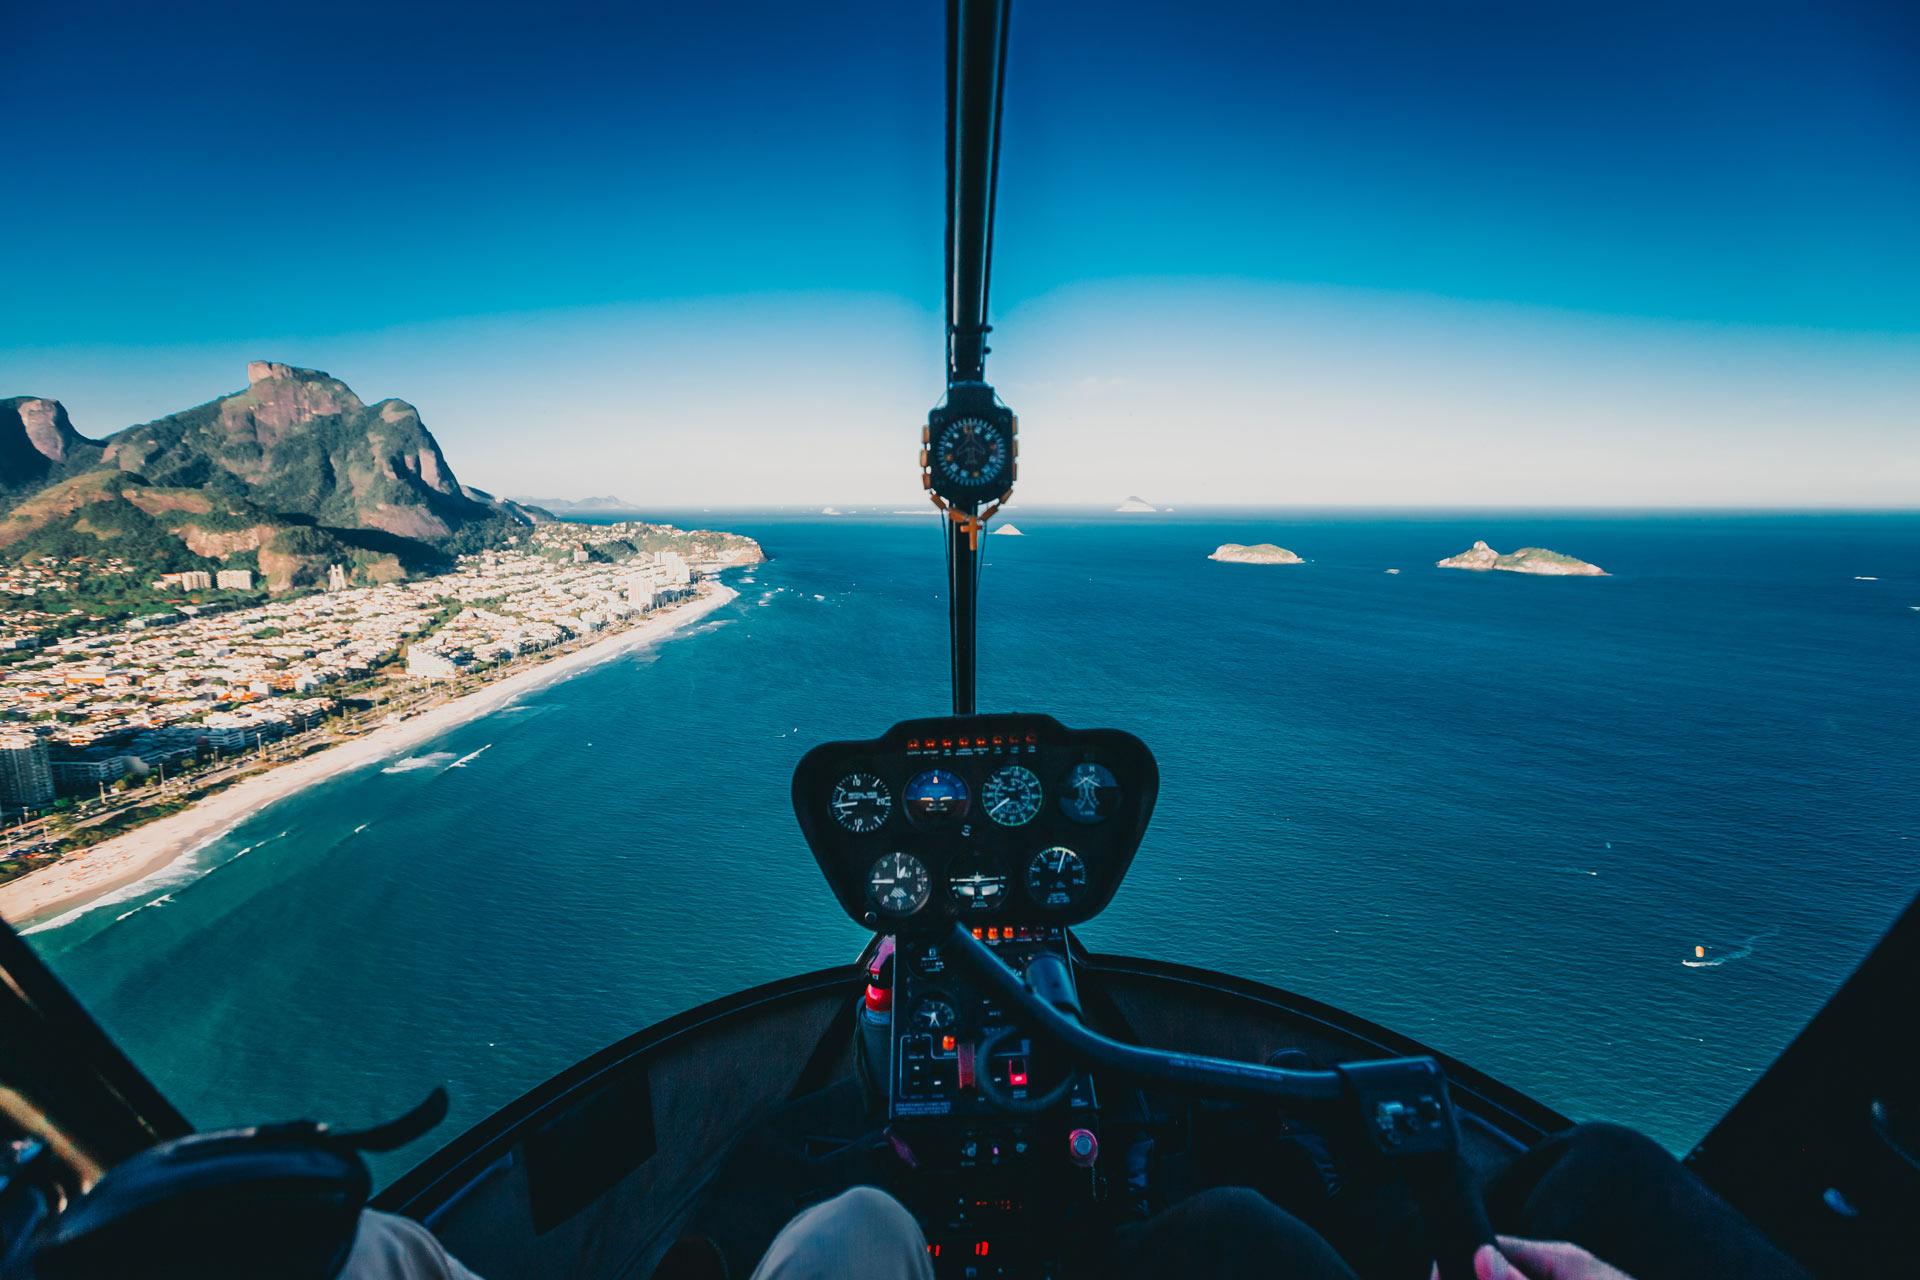 A helicopter ride around Mallorca